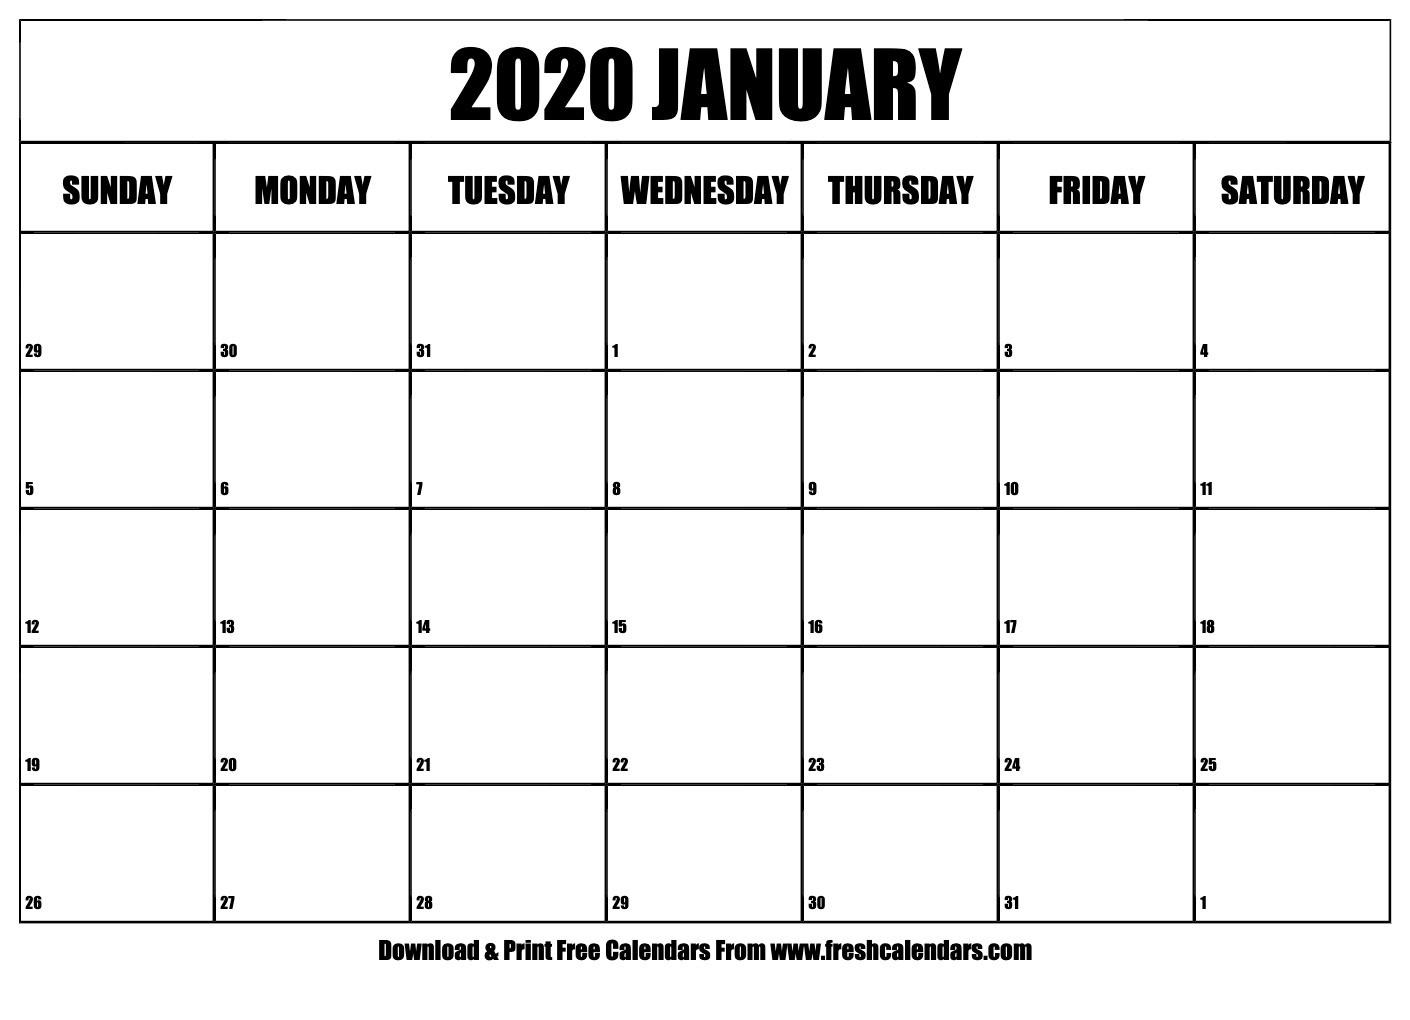 January 2020 Calendar Printable - Fresh Calendars-January 2020 Calendar Jpg